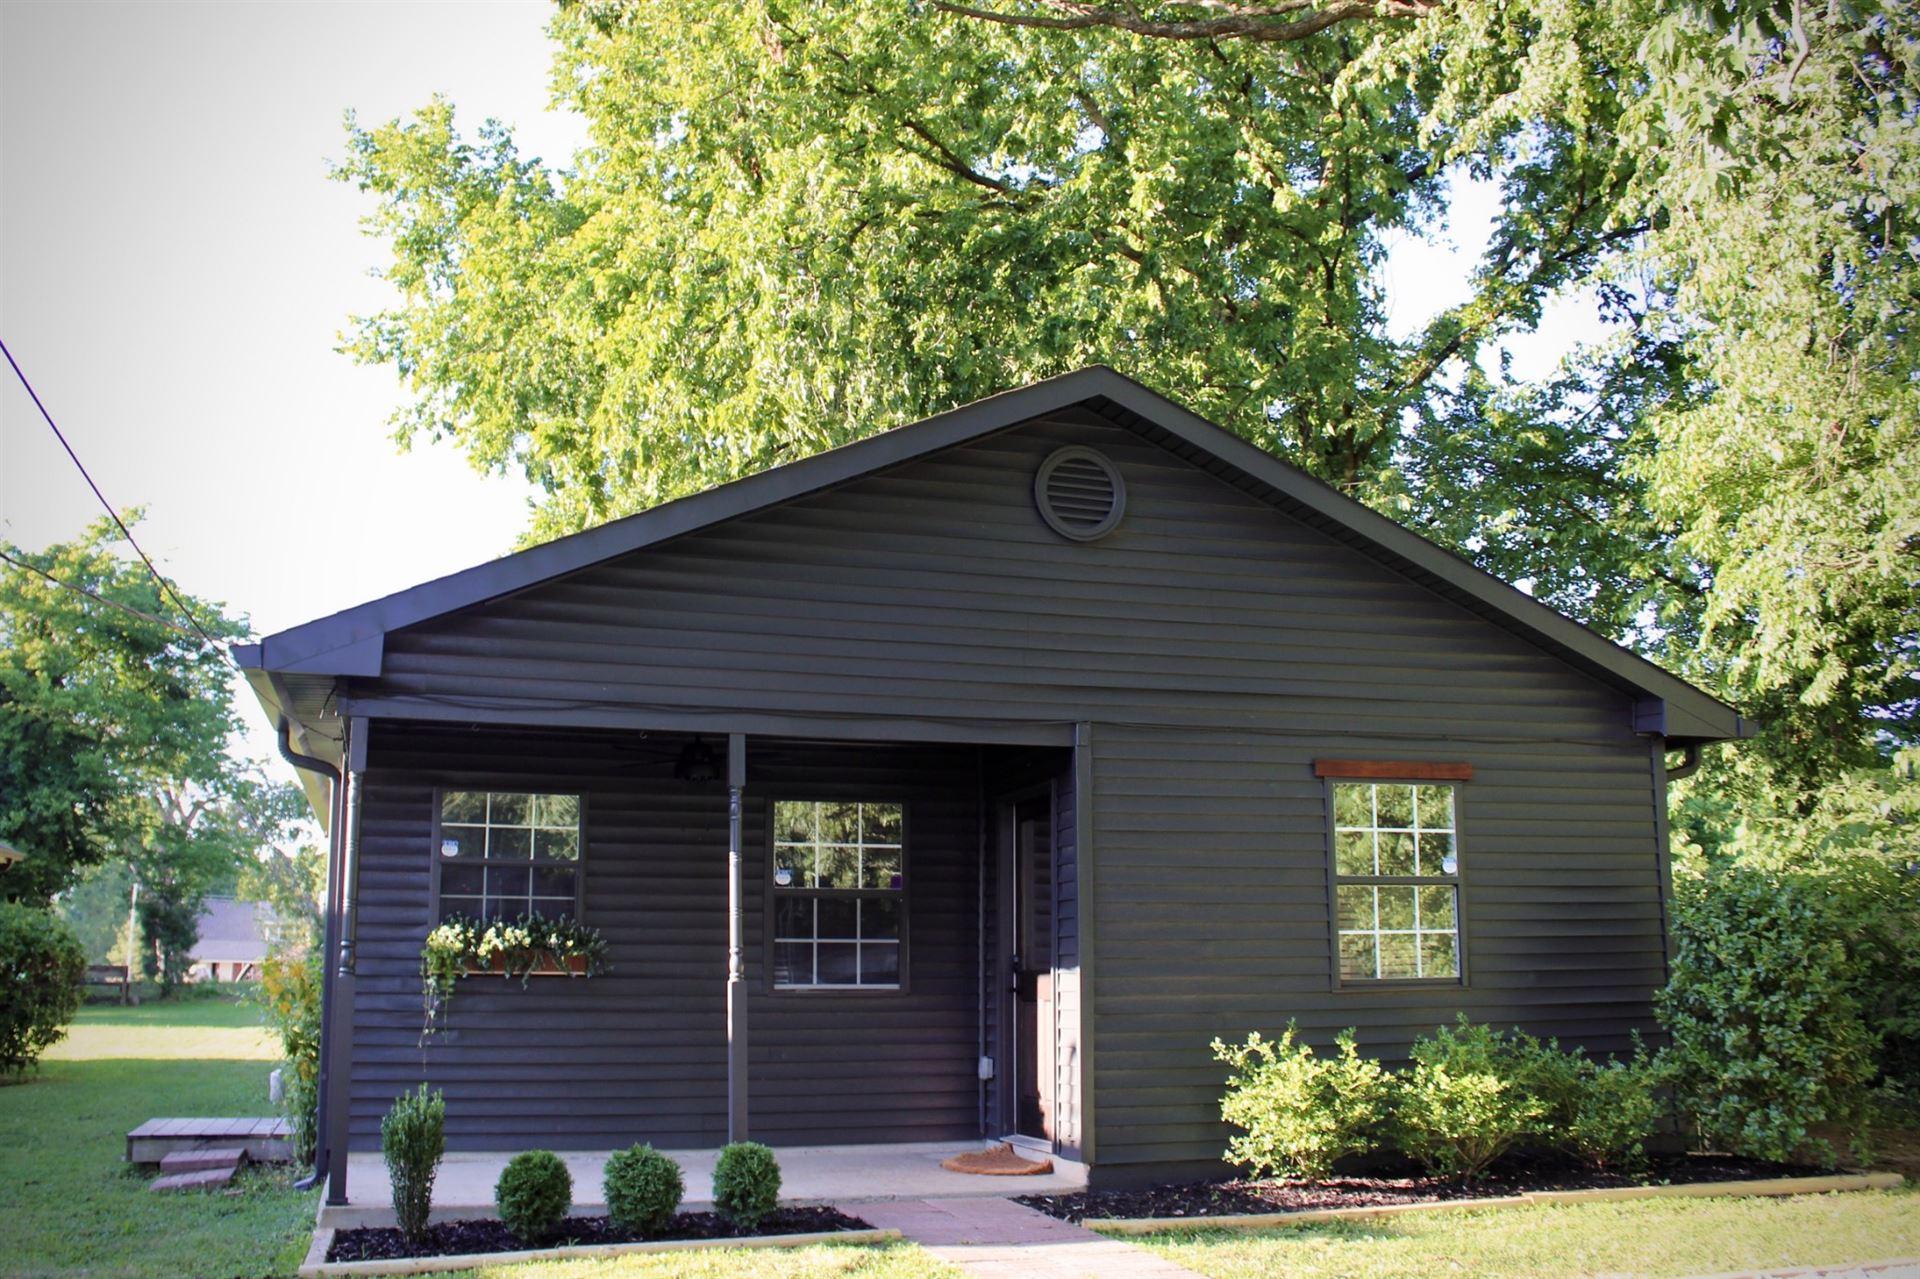 1705 Sharpe Ave, Nashville, TN 37206 - MLS#: 2262799